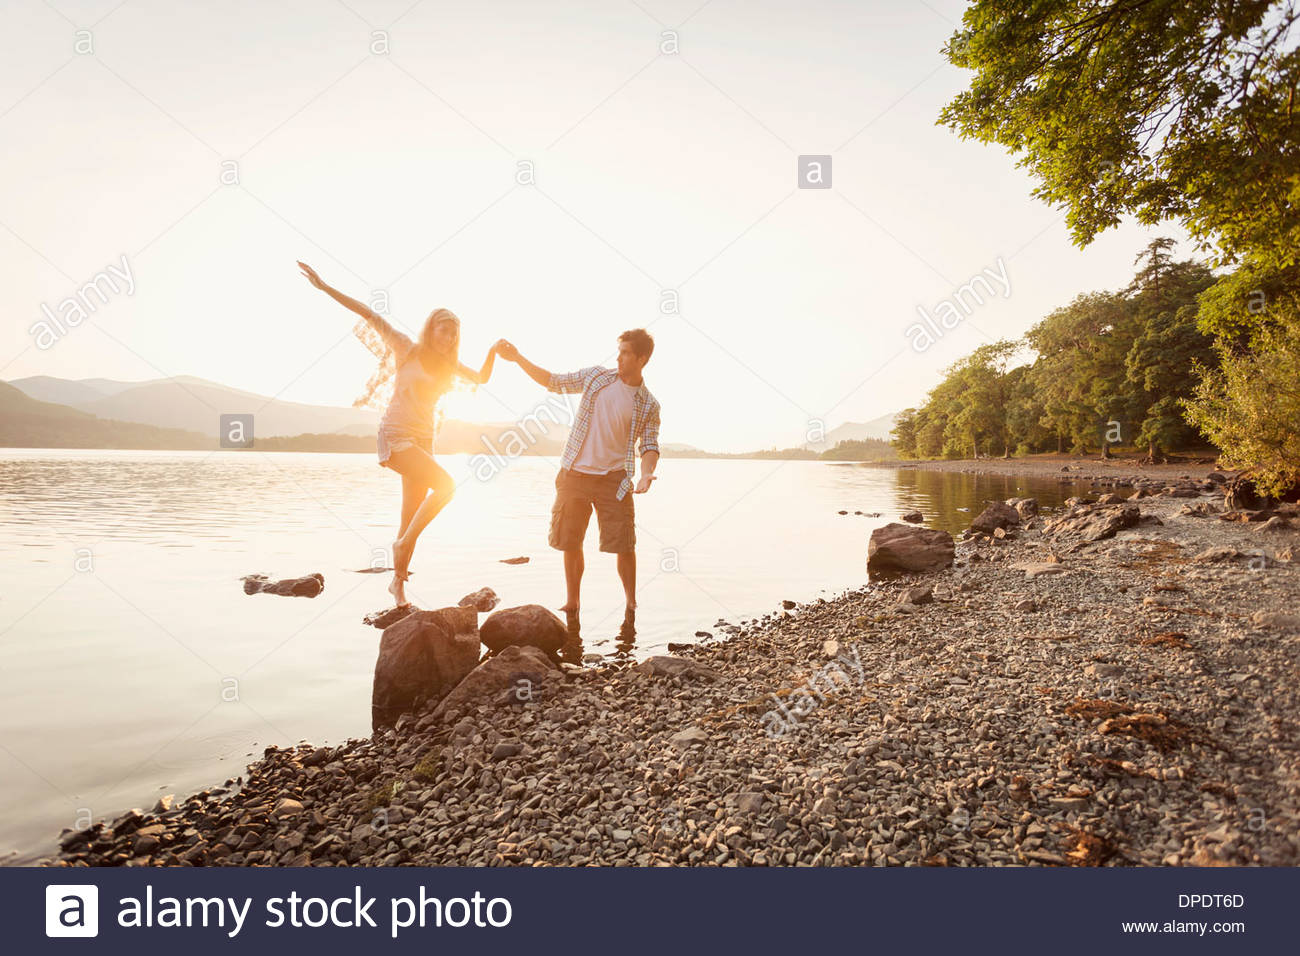 Young couple by lake, Cumbria, England, UK - Stock Image